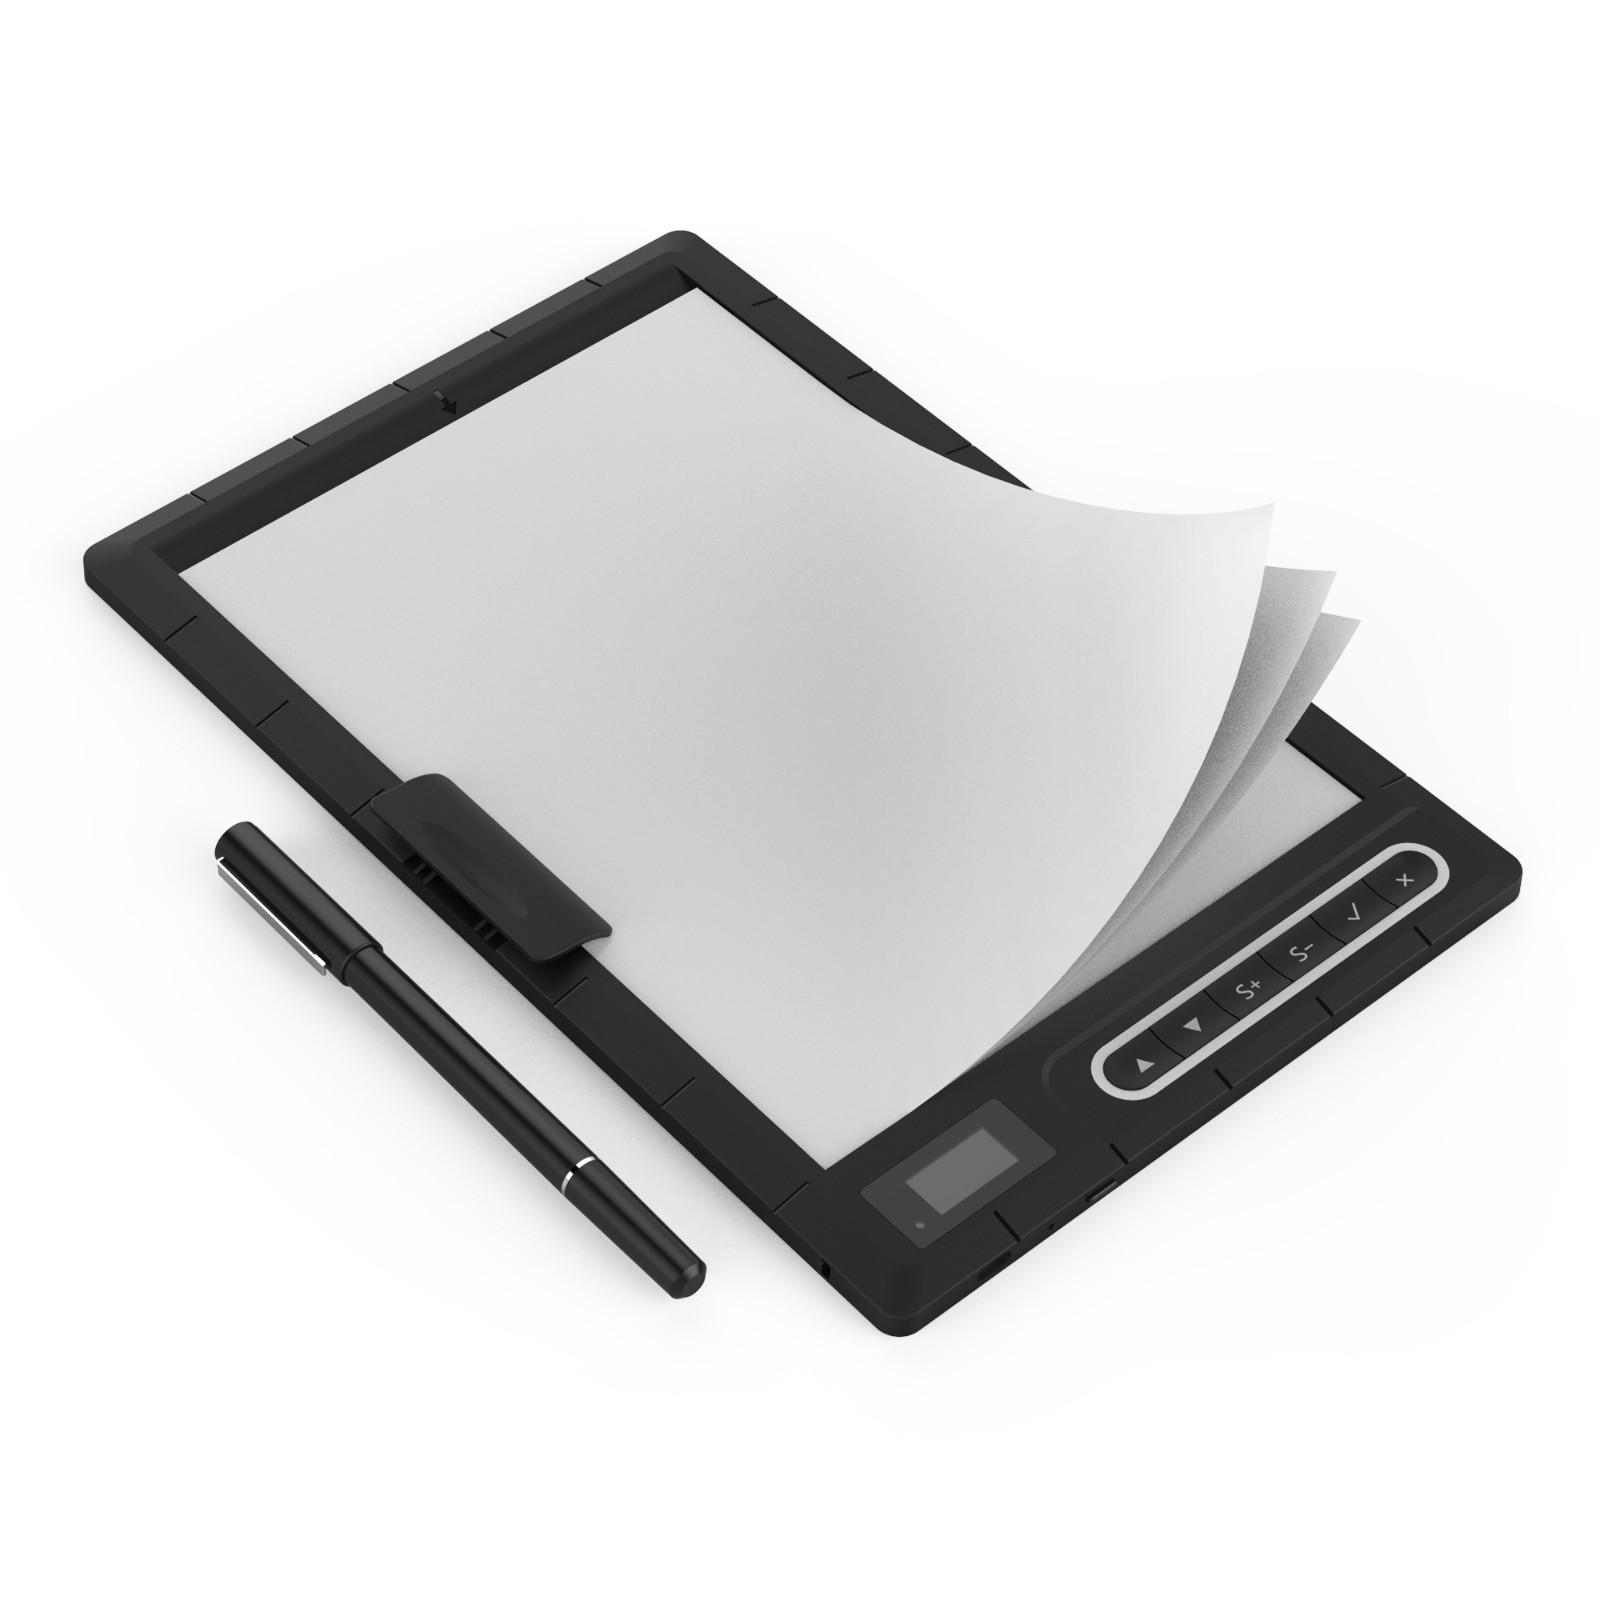 Ugee-Manufacturer Of Smart Writing Set Et-a503-2